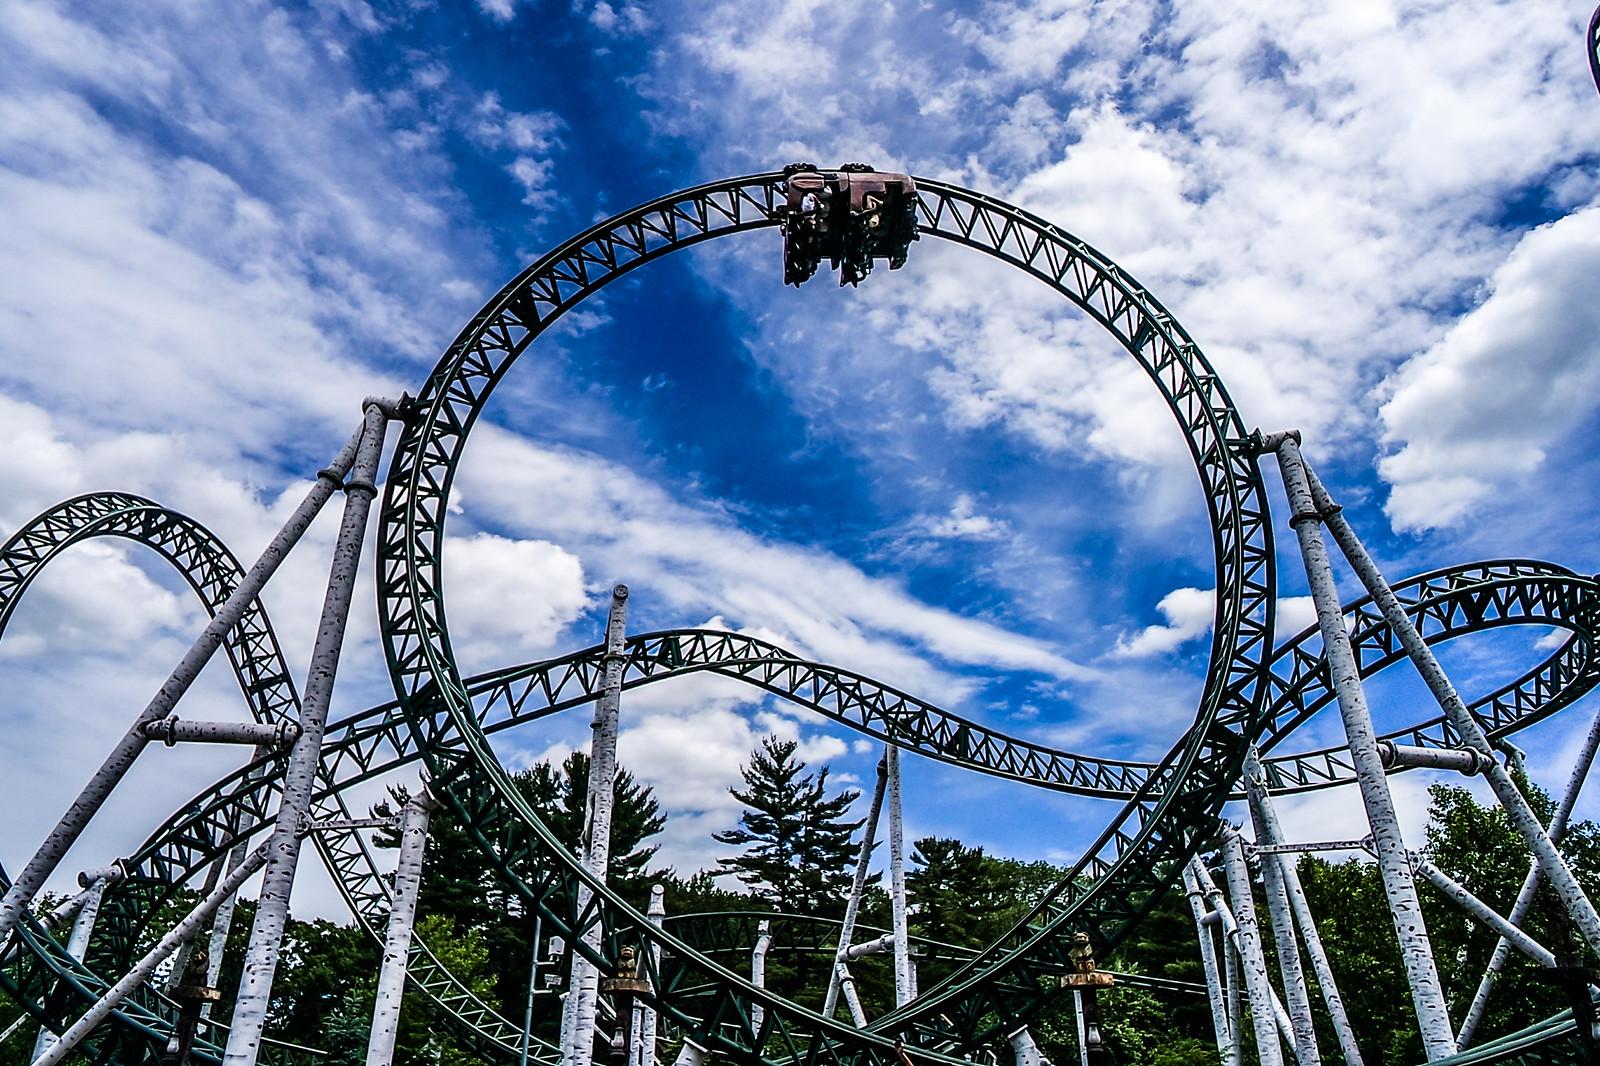 Untamed Roller Coaster at Canobie Lake Amusement Park